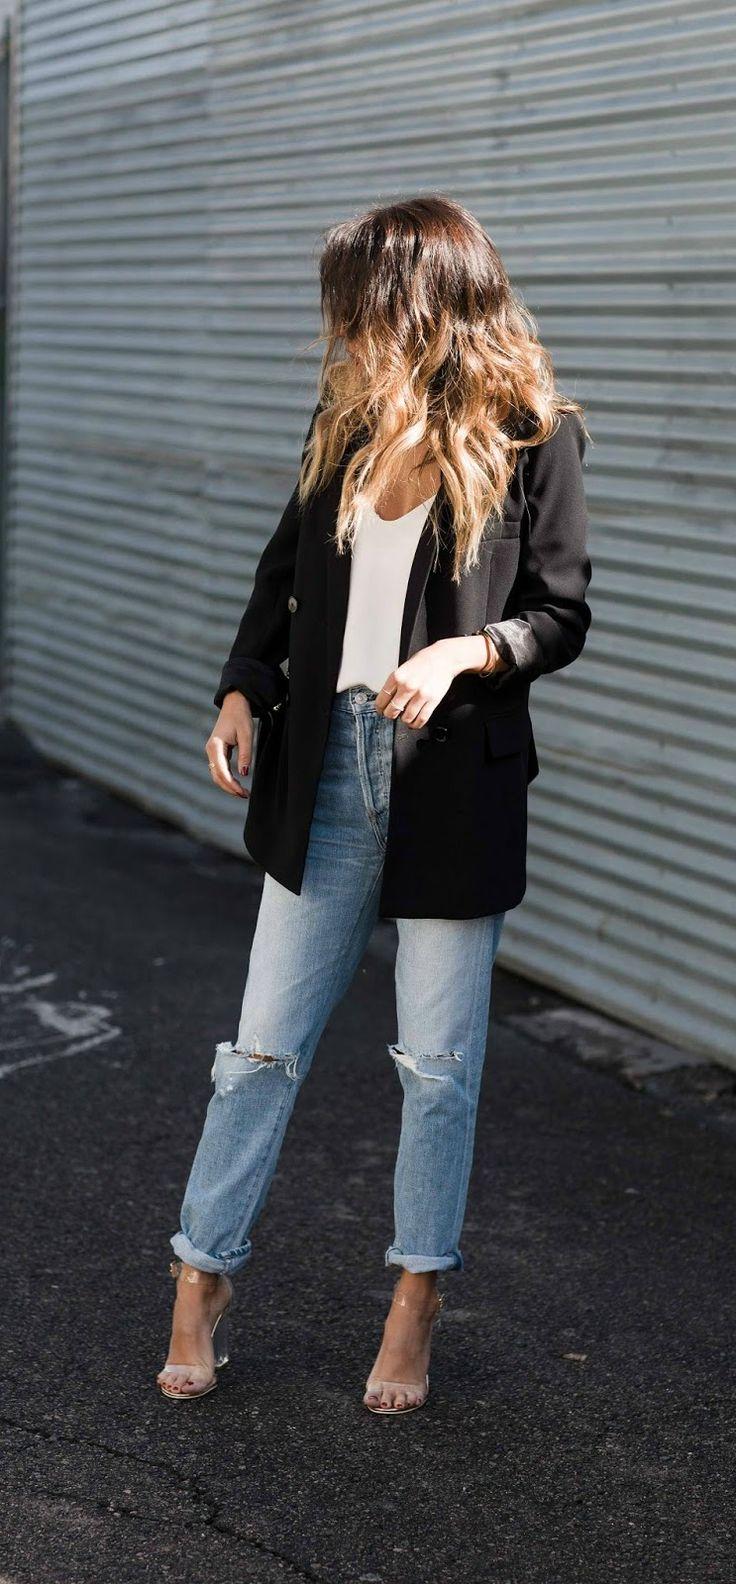 weekend outfit: boyfriend jeans x oversized blazer